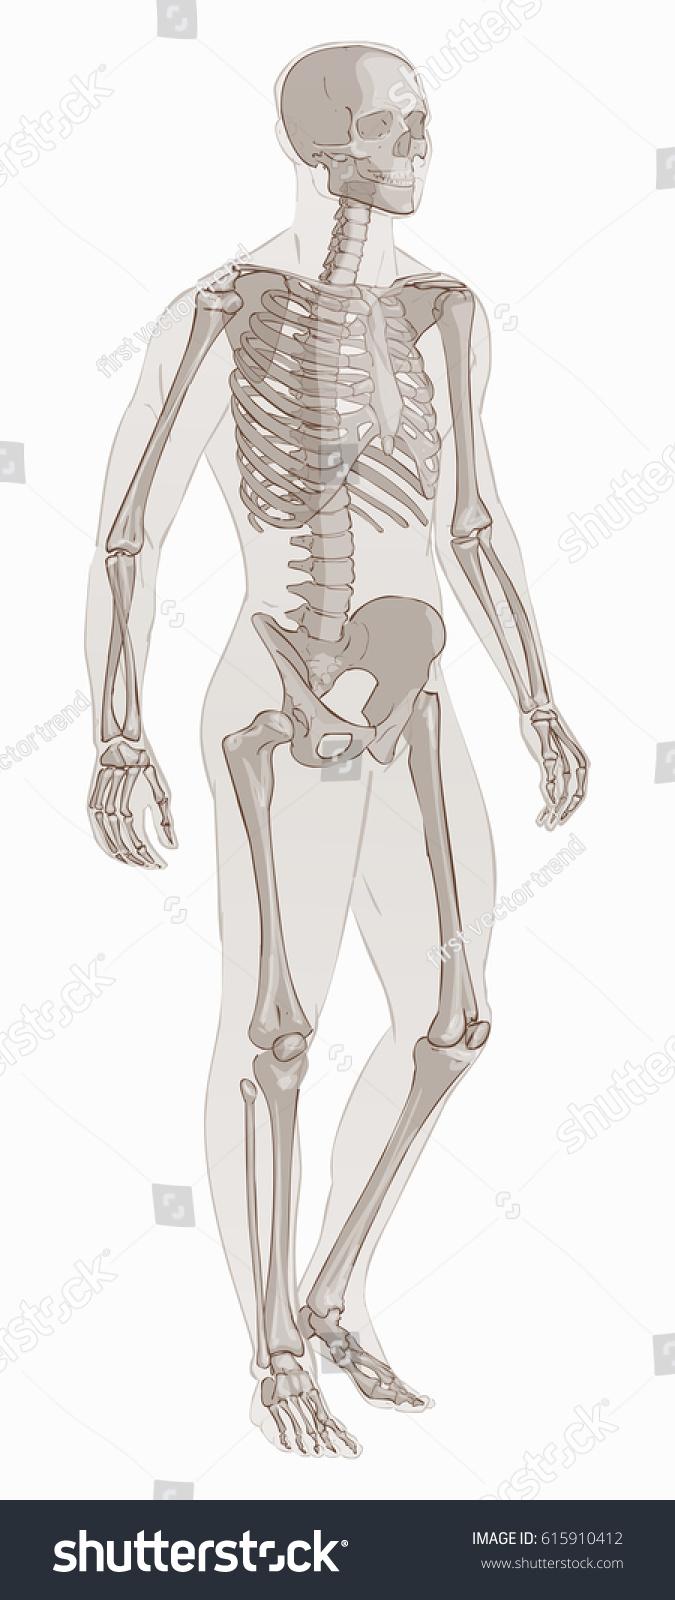 Human Body Parts Man Skeletal Anatomy Stock Illustration 615910412